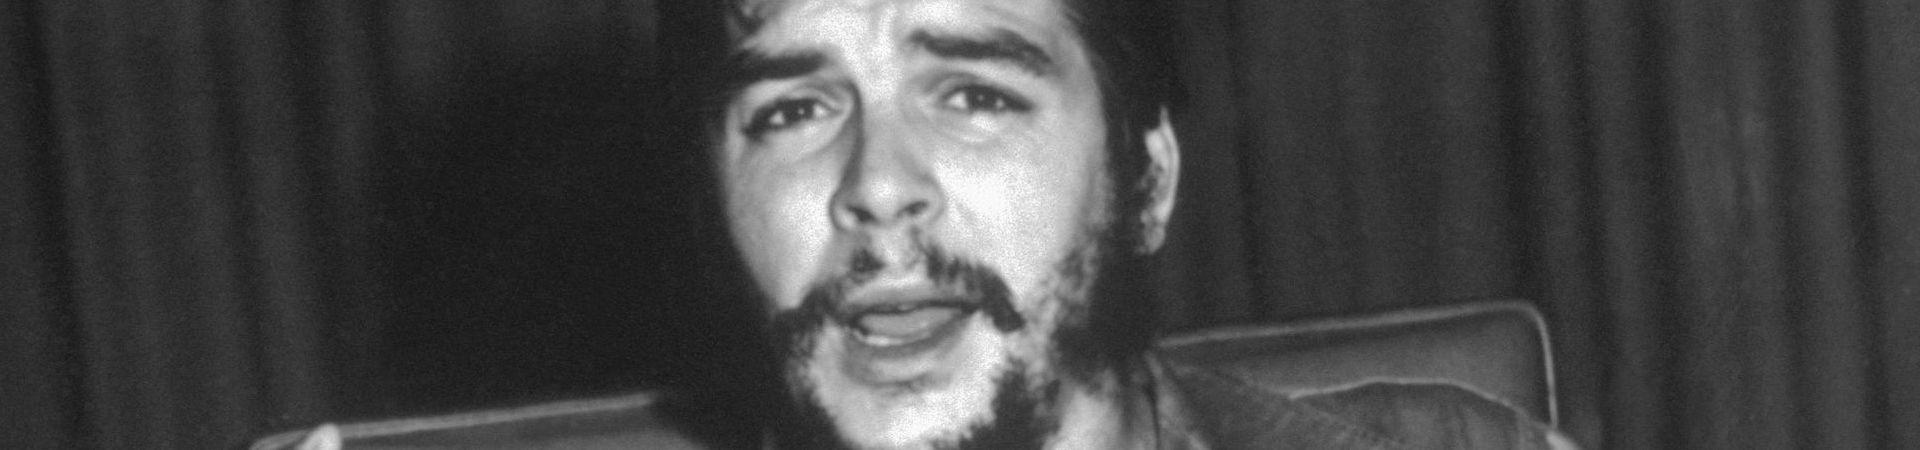 Photo du Che Guevara